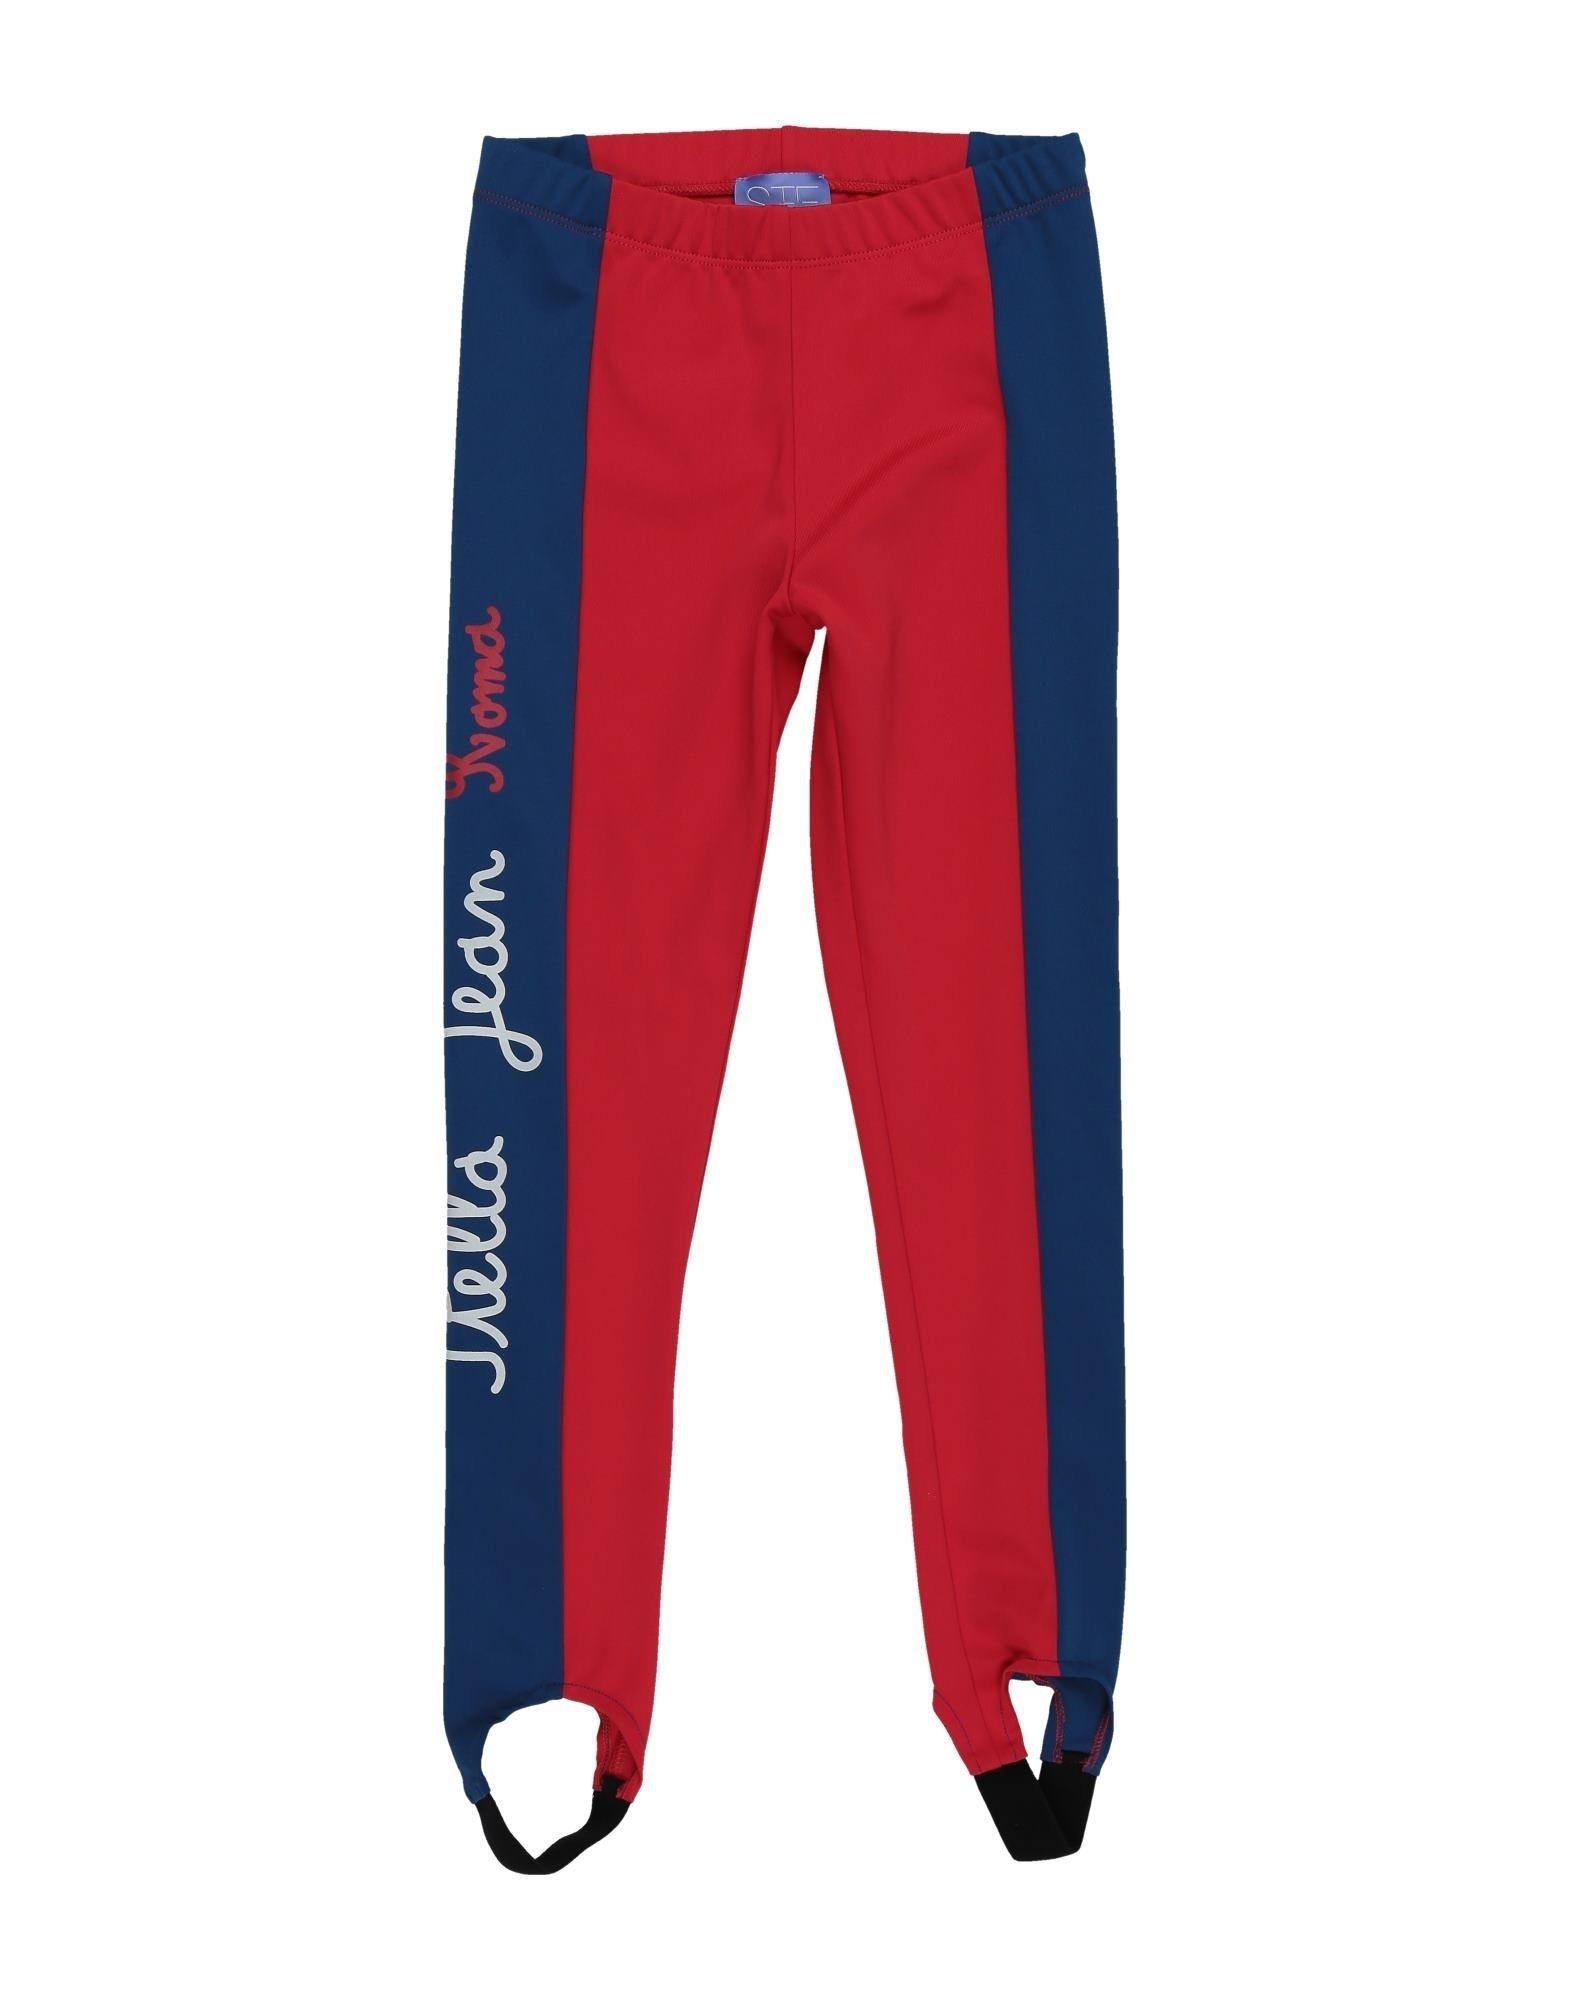 Stella Jean Kids' Leggings In Red